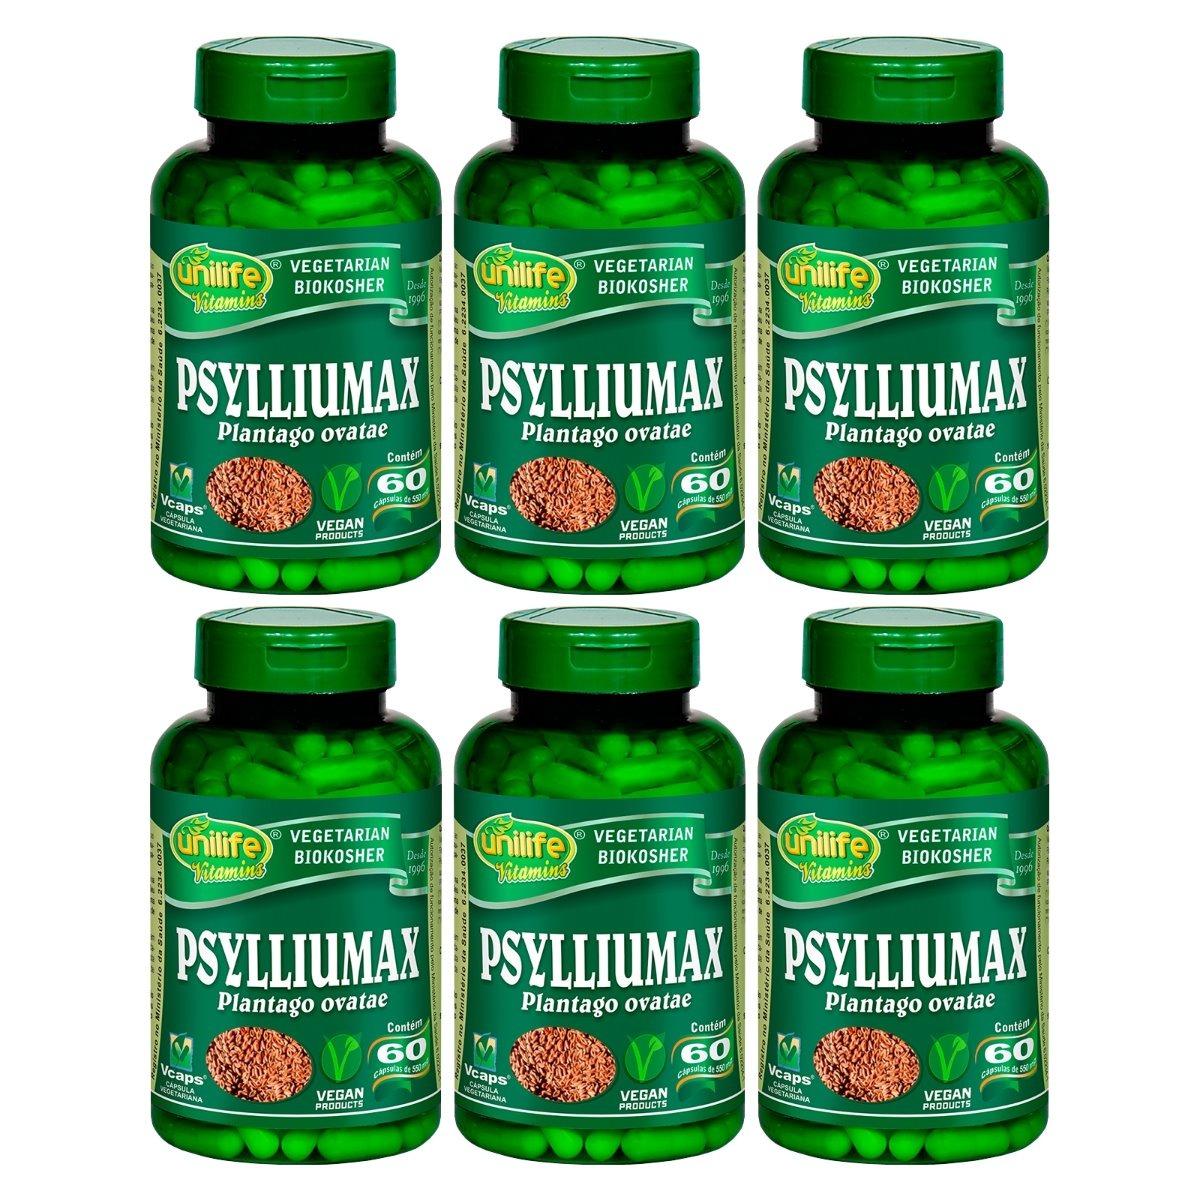 Psylliumax Psyllium 60 Cápsulas 550mg Unilife Kit 6 Unidades